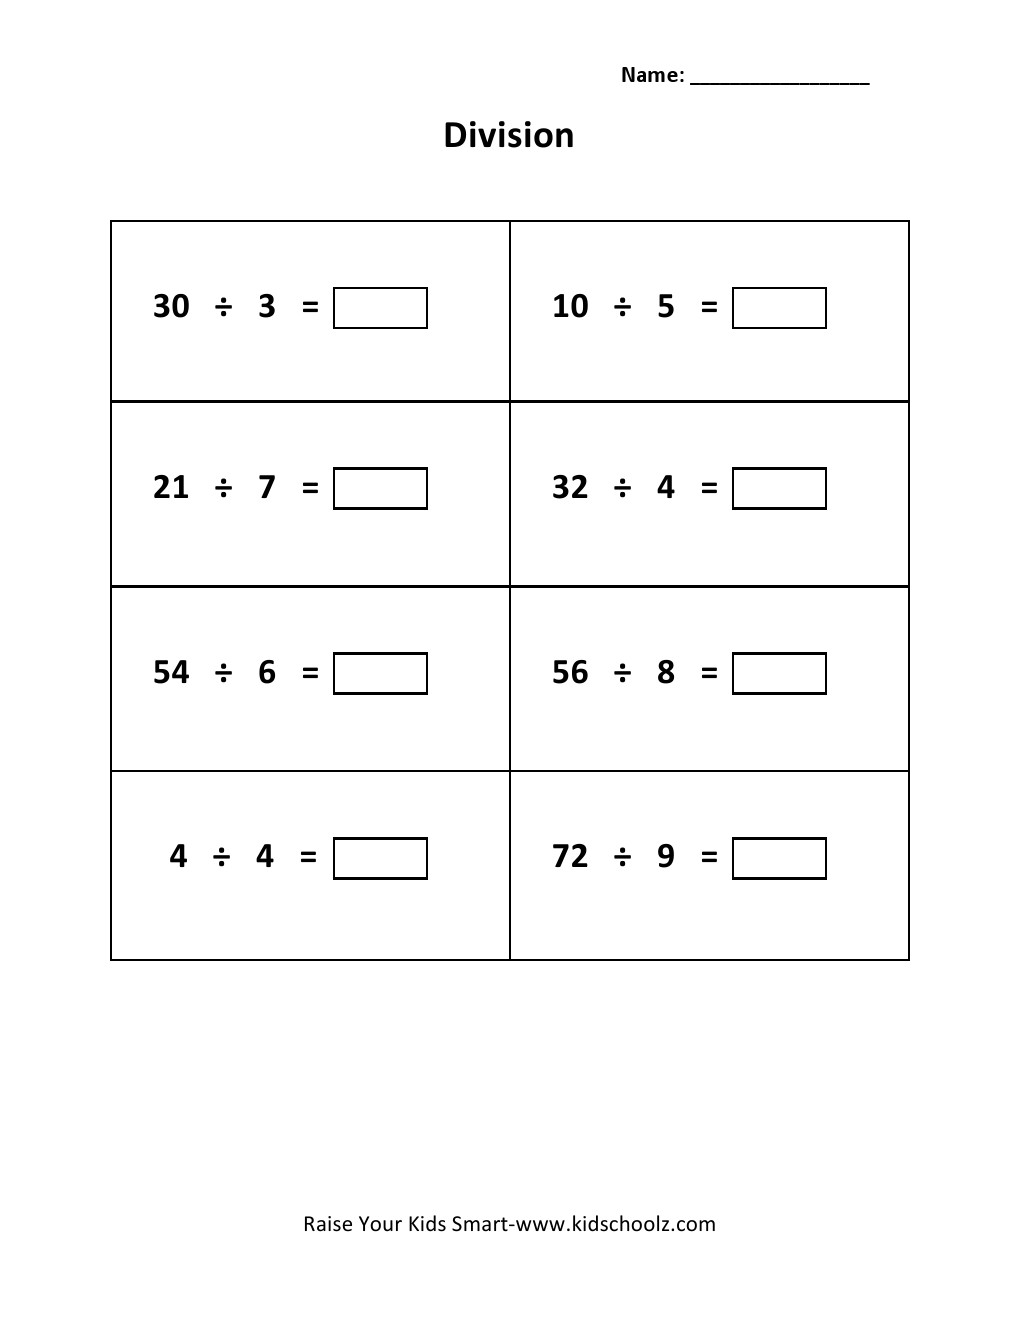 hight resolution of Grade 3 - Division Worksheet 9 - Kidschoolz